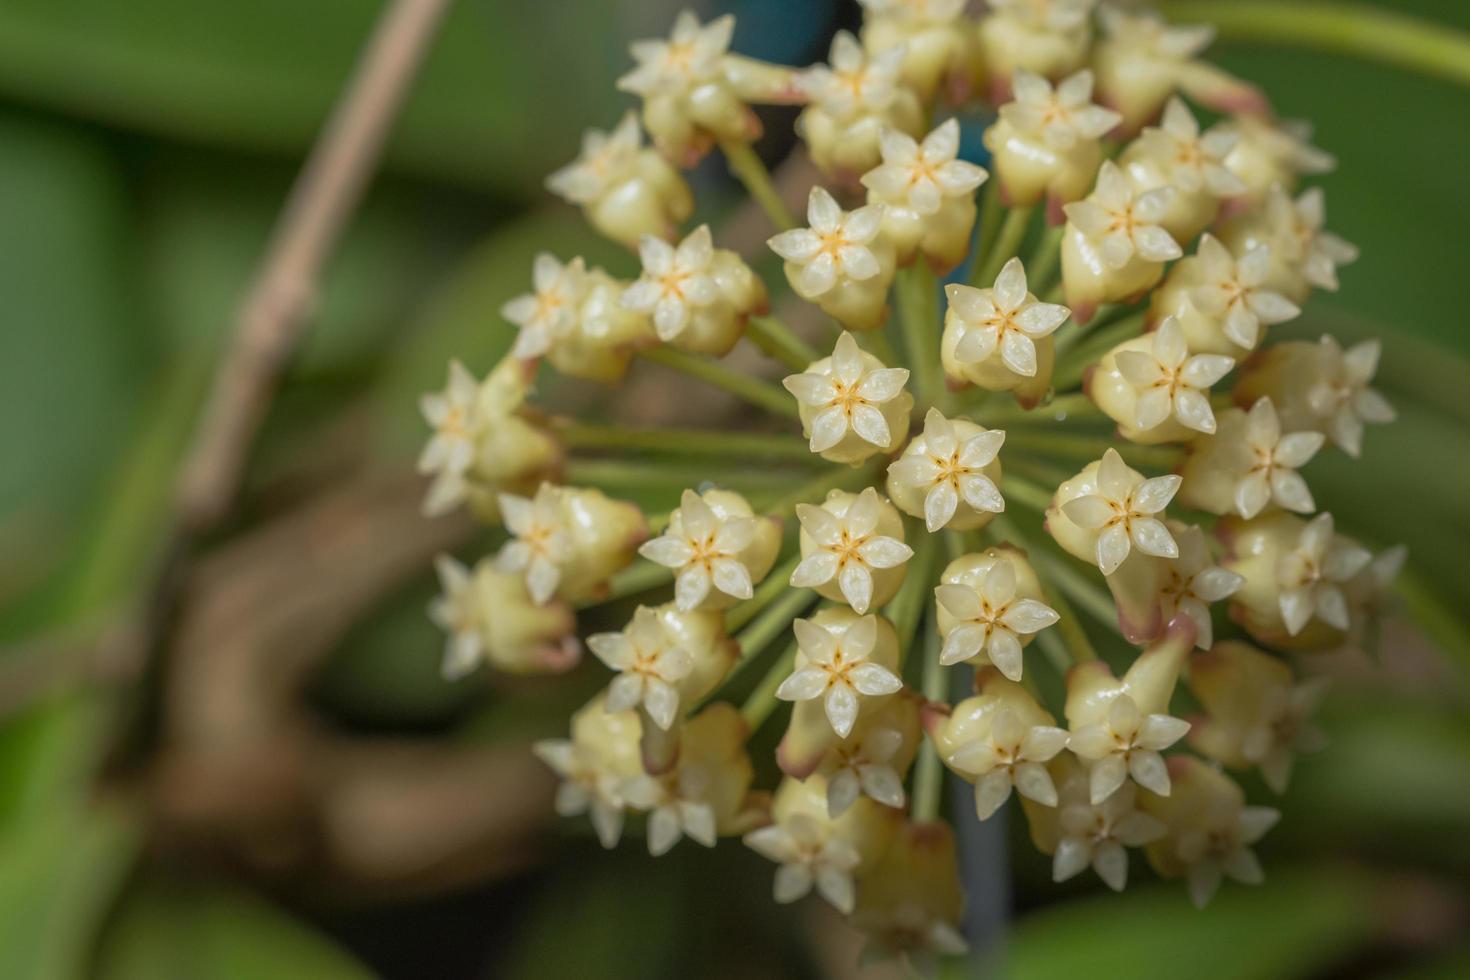 flor de hoya blanca foto